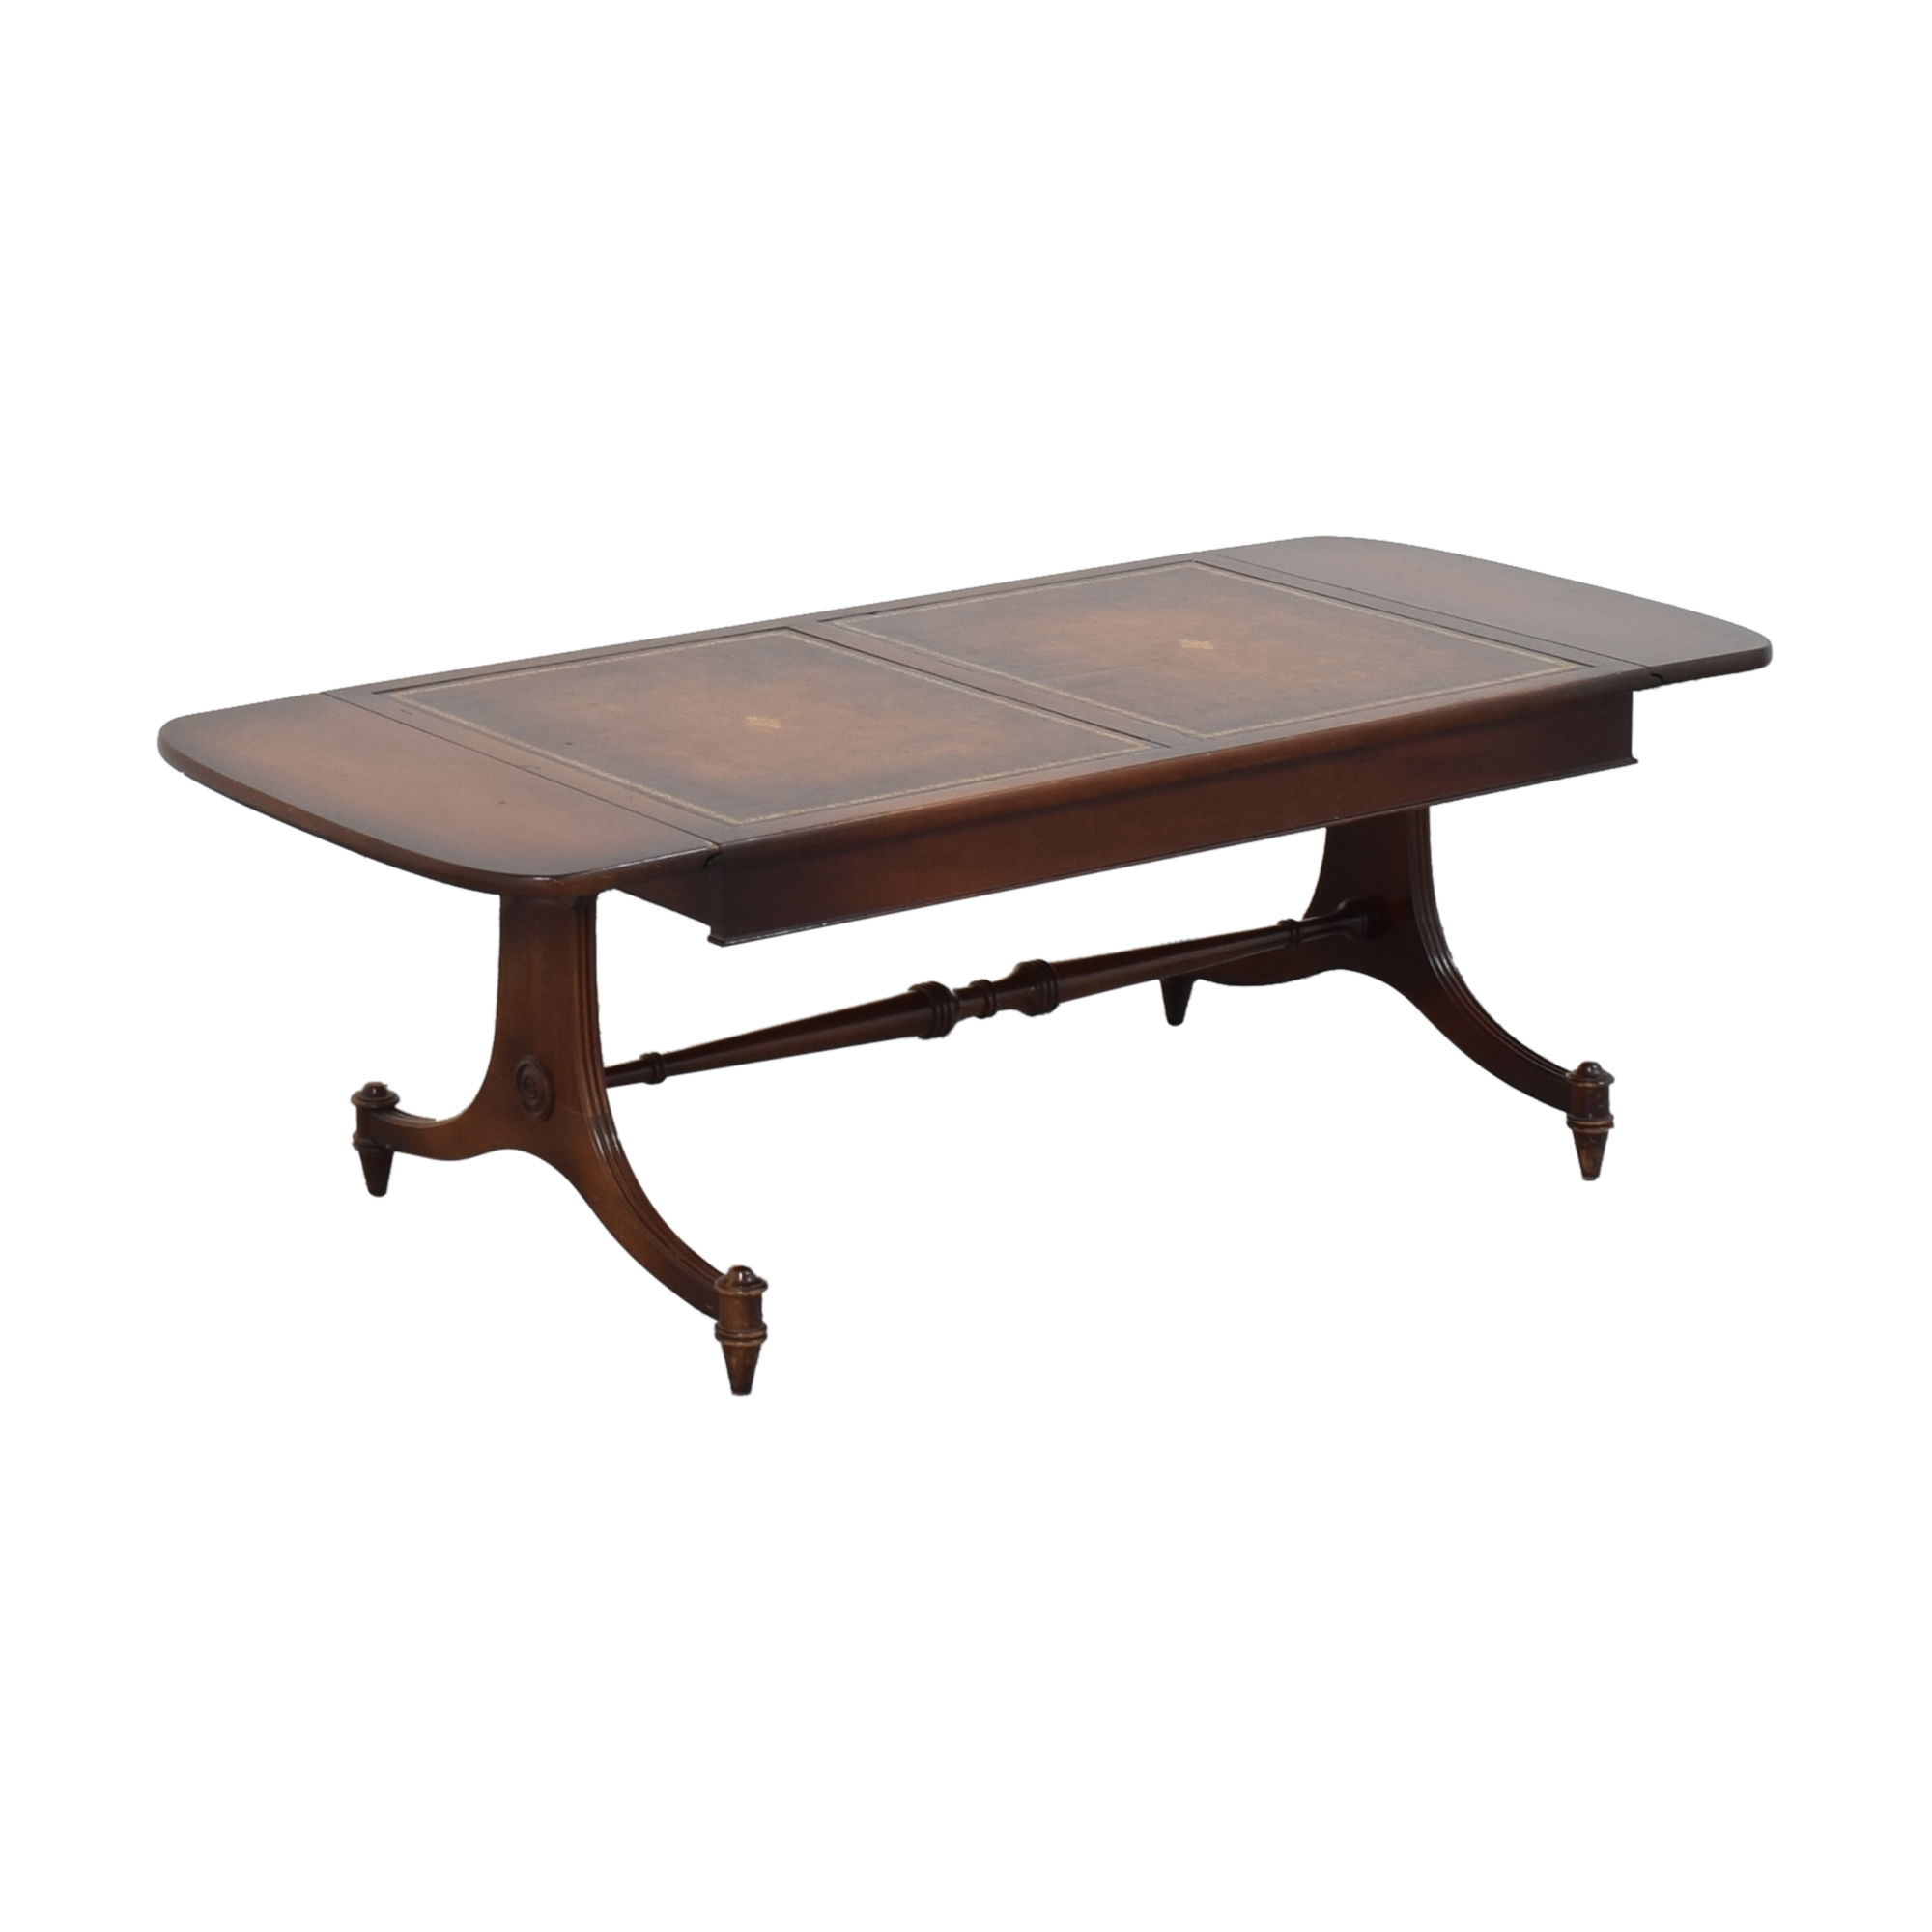 Gordon's Furniture Drop Leaf Coffee Table / Coffee Tables